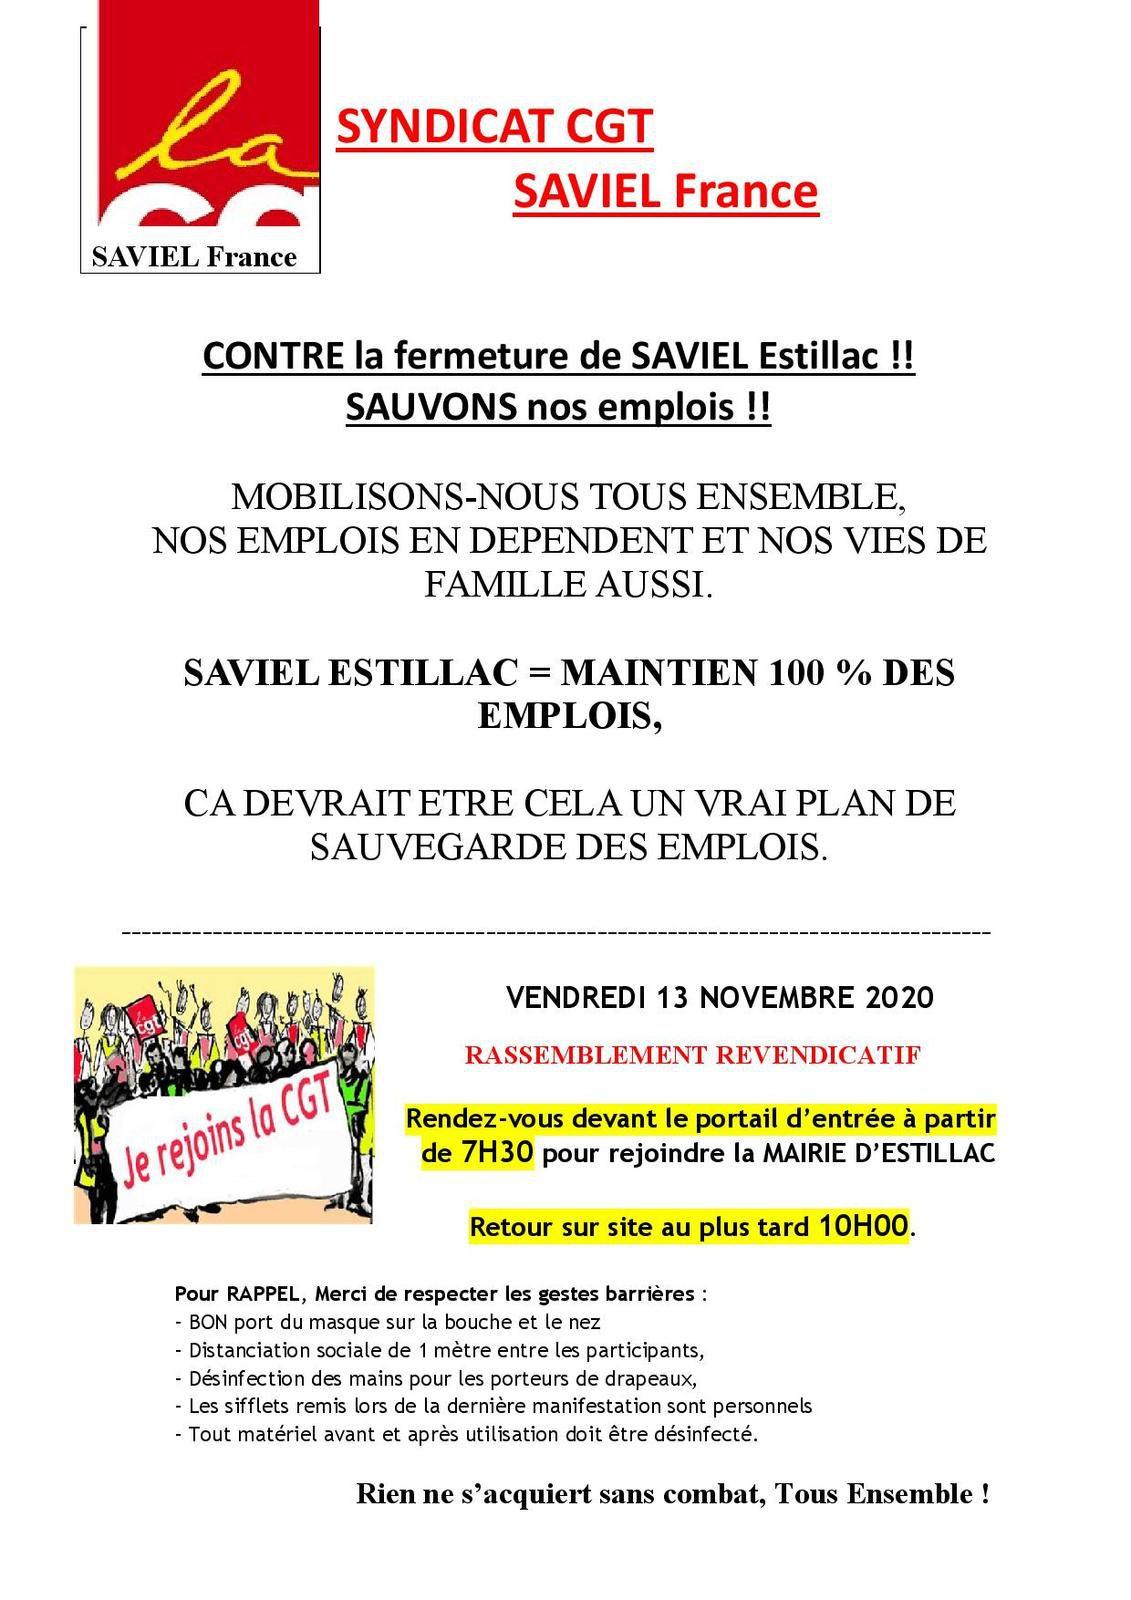 SAVIEL FRANCE ACTION DU VENDREDI 13 NOVEMBRE